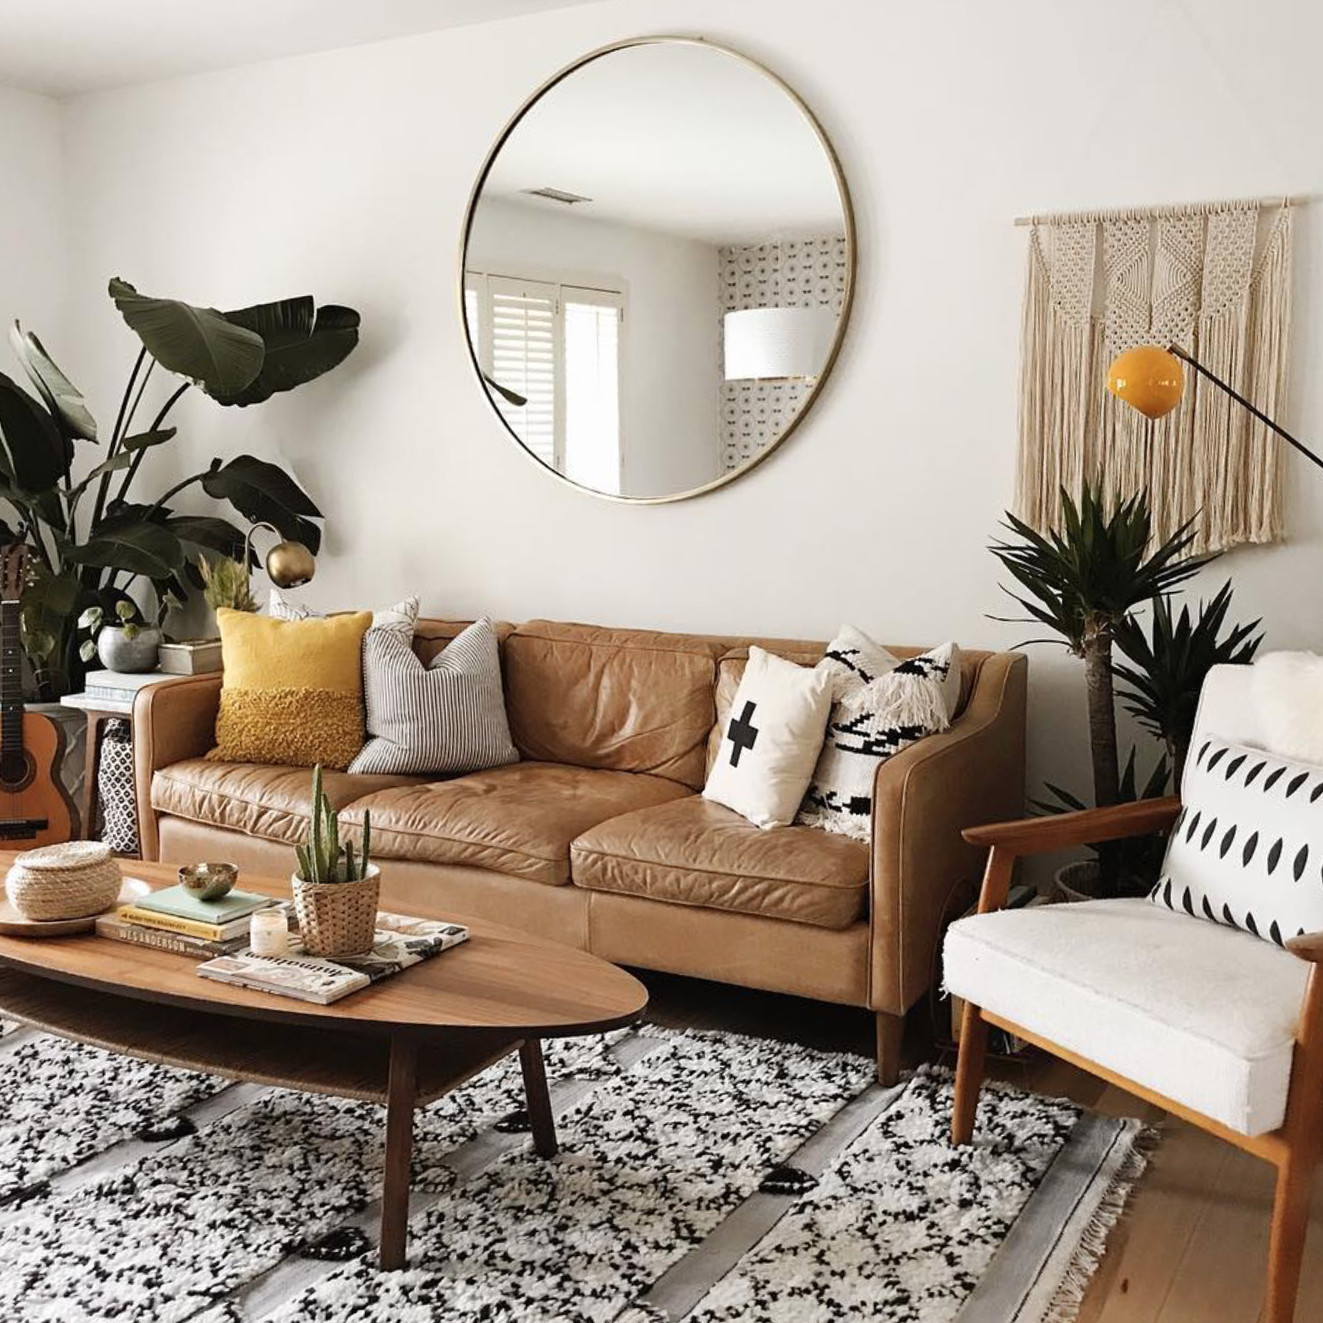 Small Living Room Decor Ideas  7 Apartment Decorating and Small Living Room Ideas